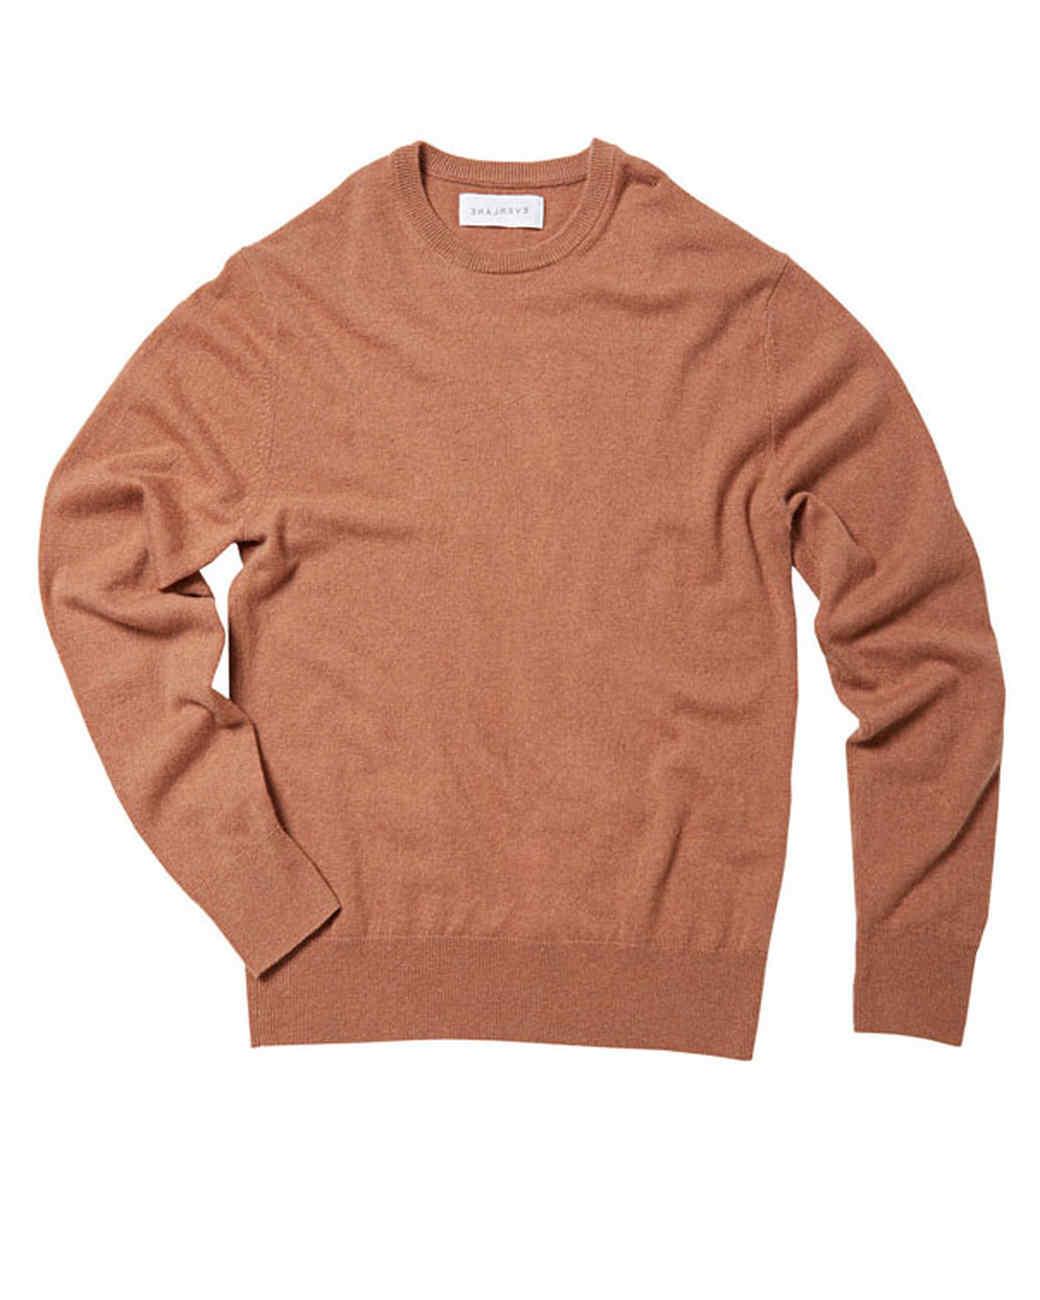 everlane sweater